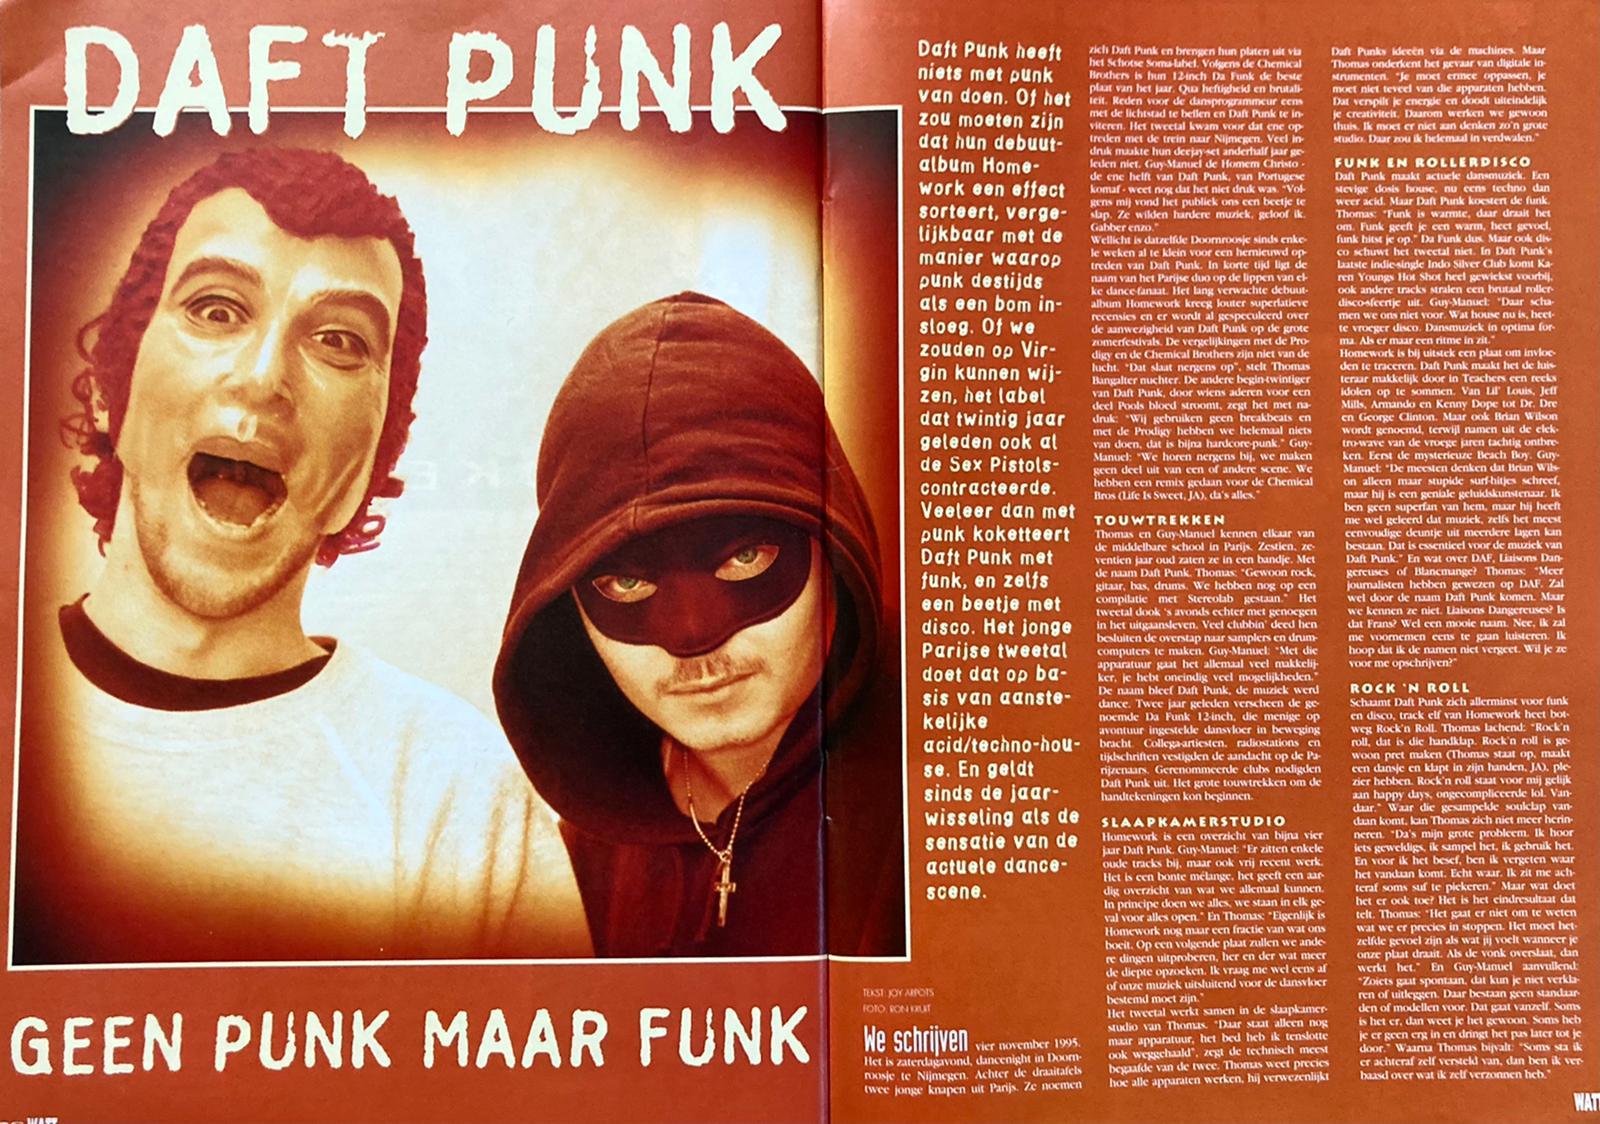 Artikel Daft Punk (bron: WATT, nr. 45, april 1997), fotografie: Ron Kruit